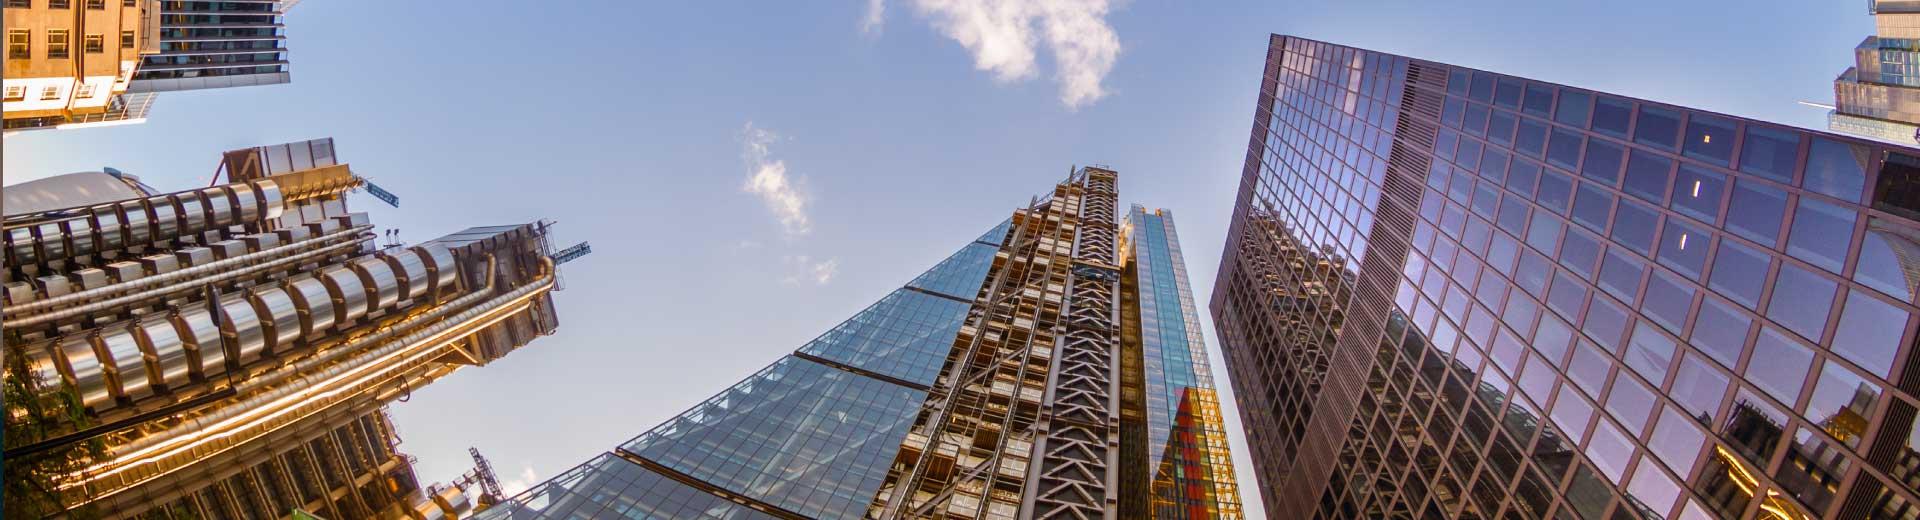 NBC Banking skyscrapers